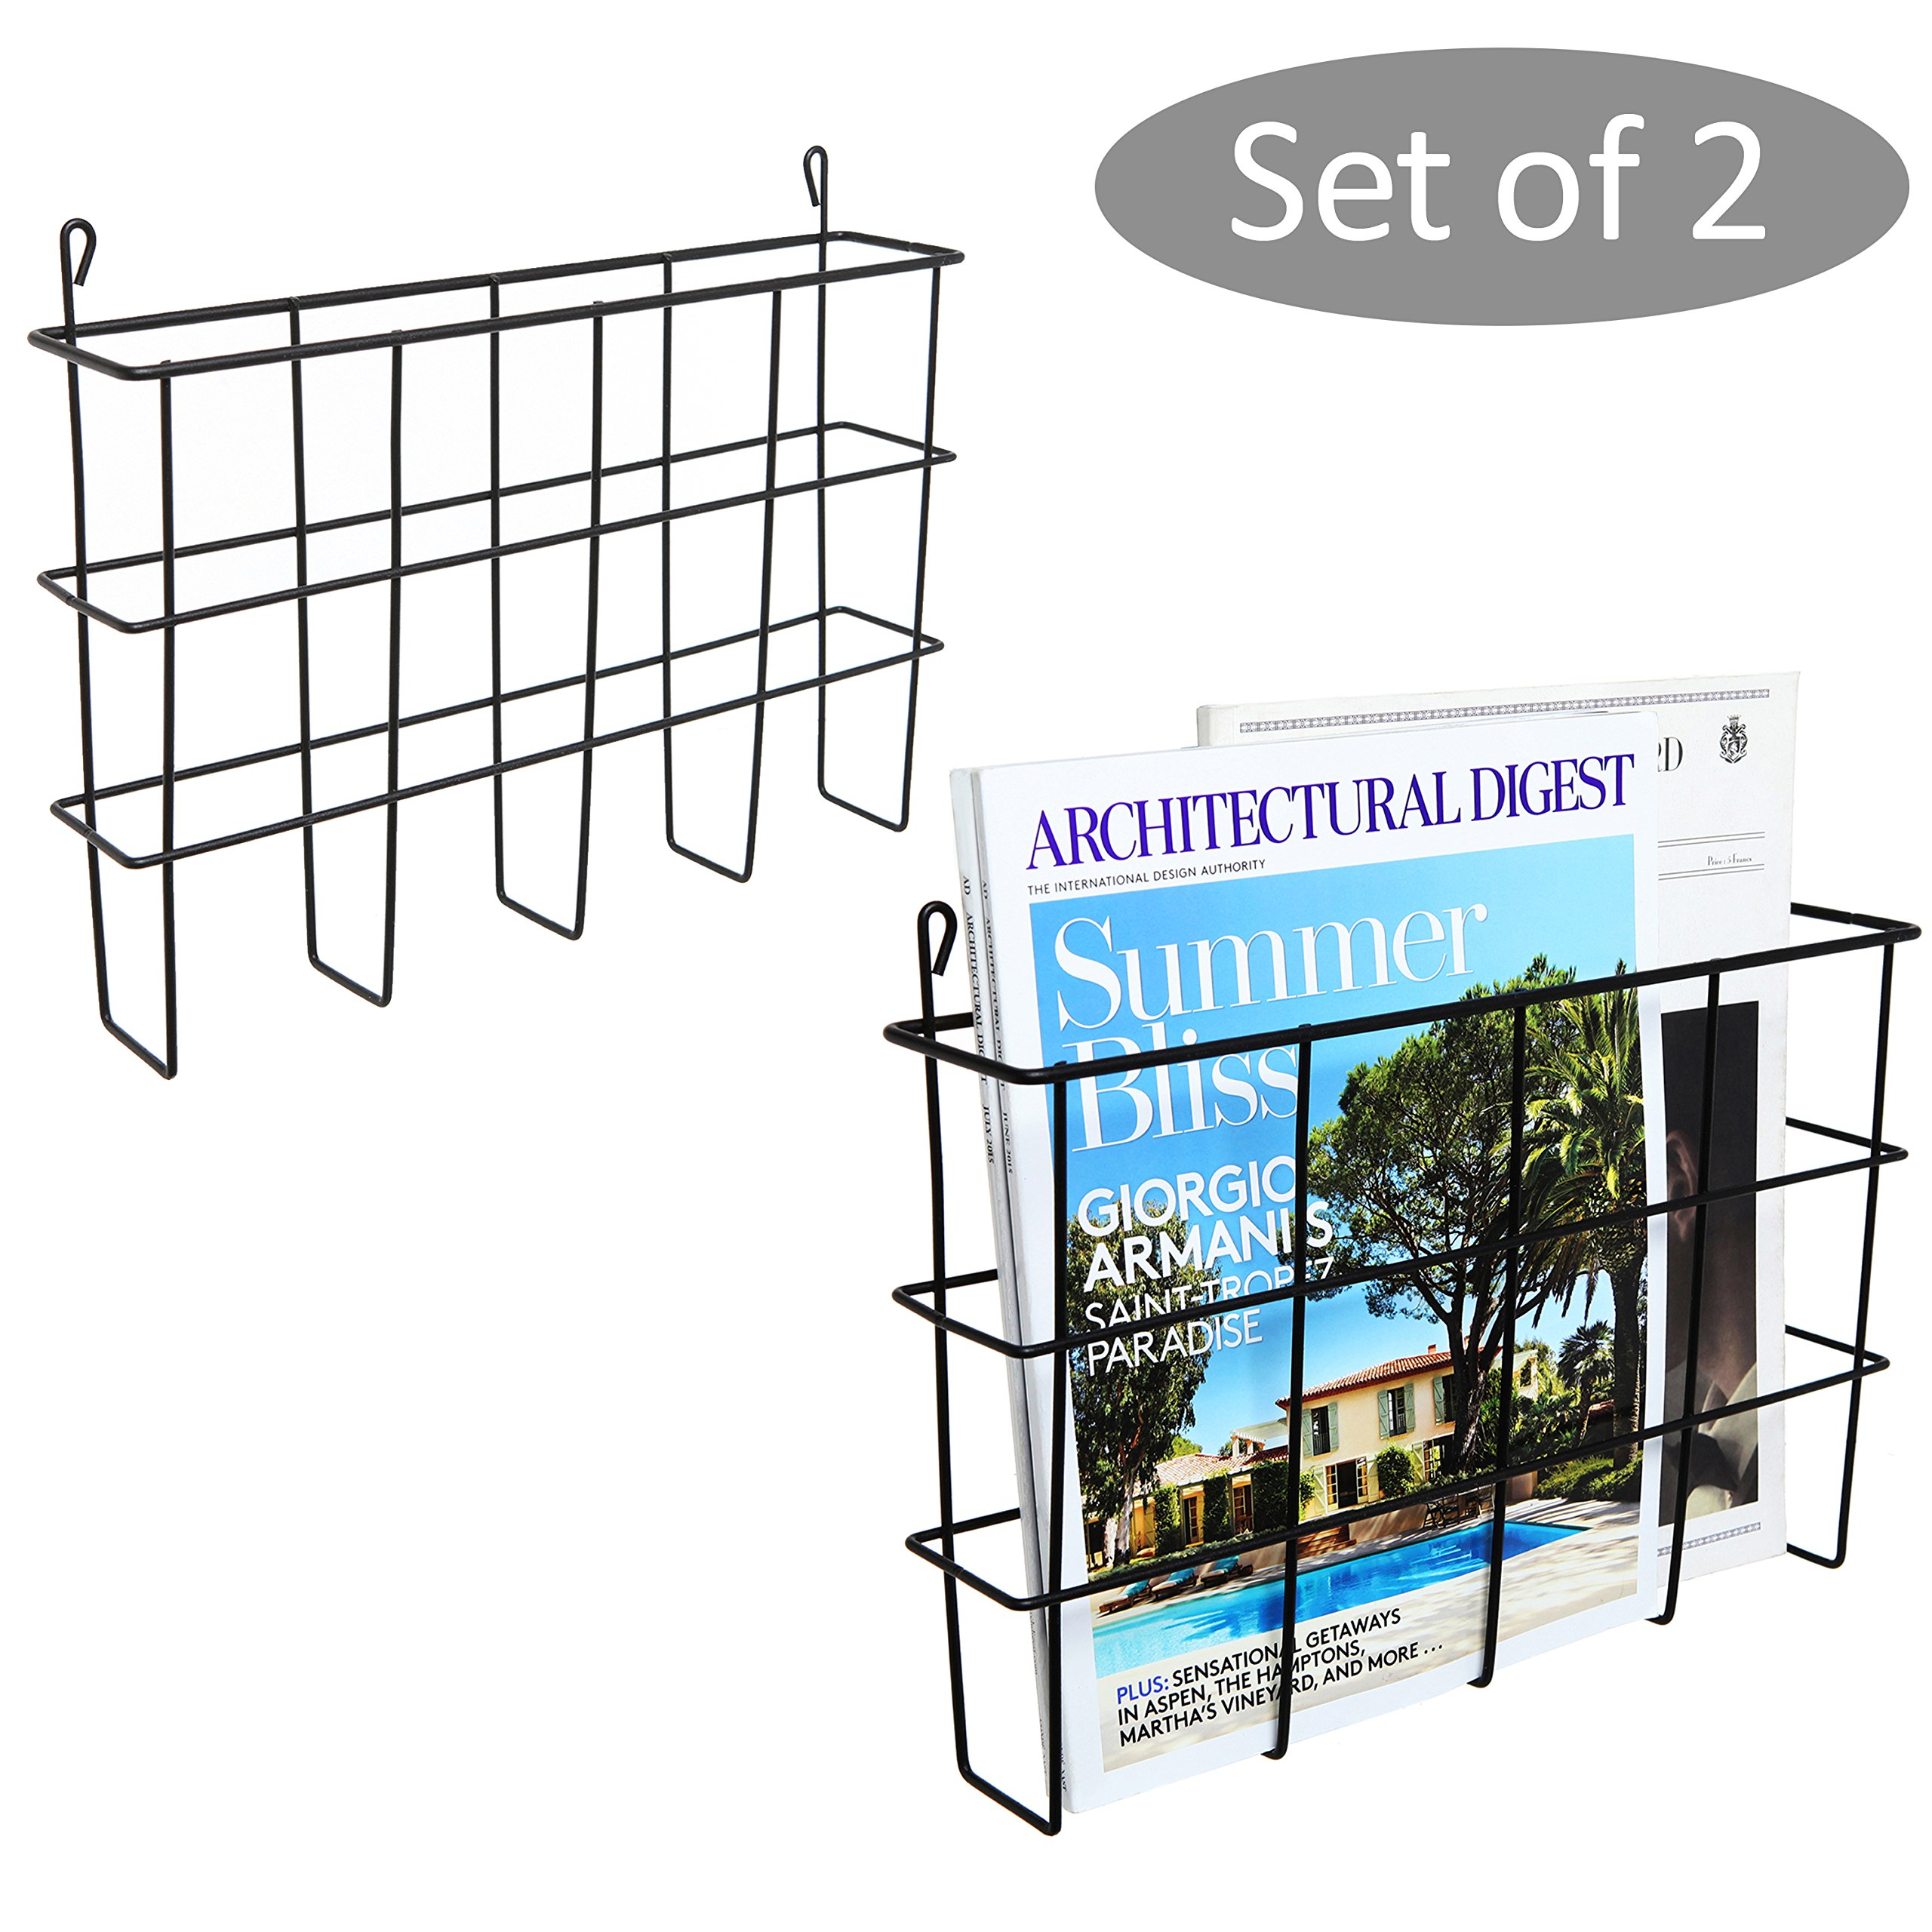 Set of 2 Black Metal Wire Wall Mounted Magazine Holders, File Folder Racks